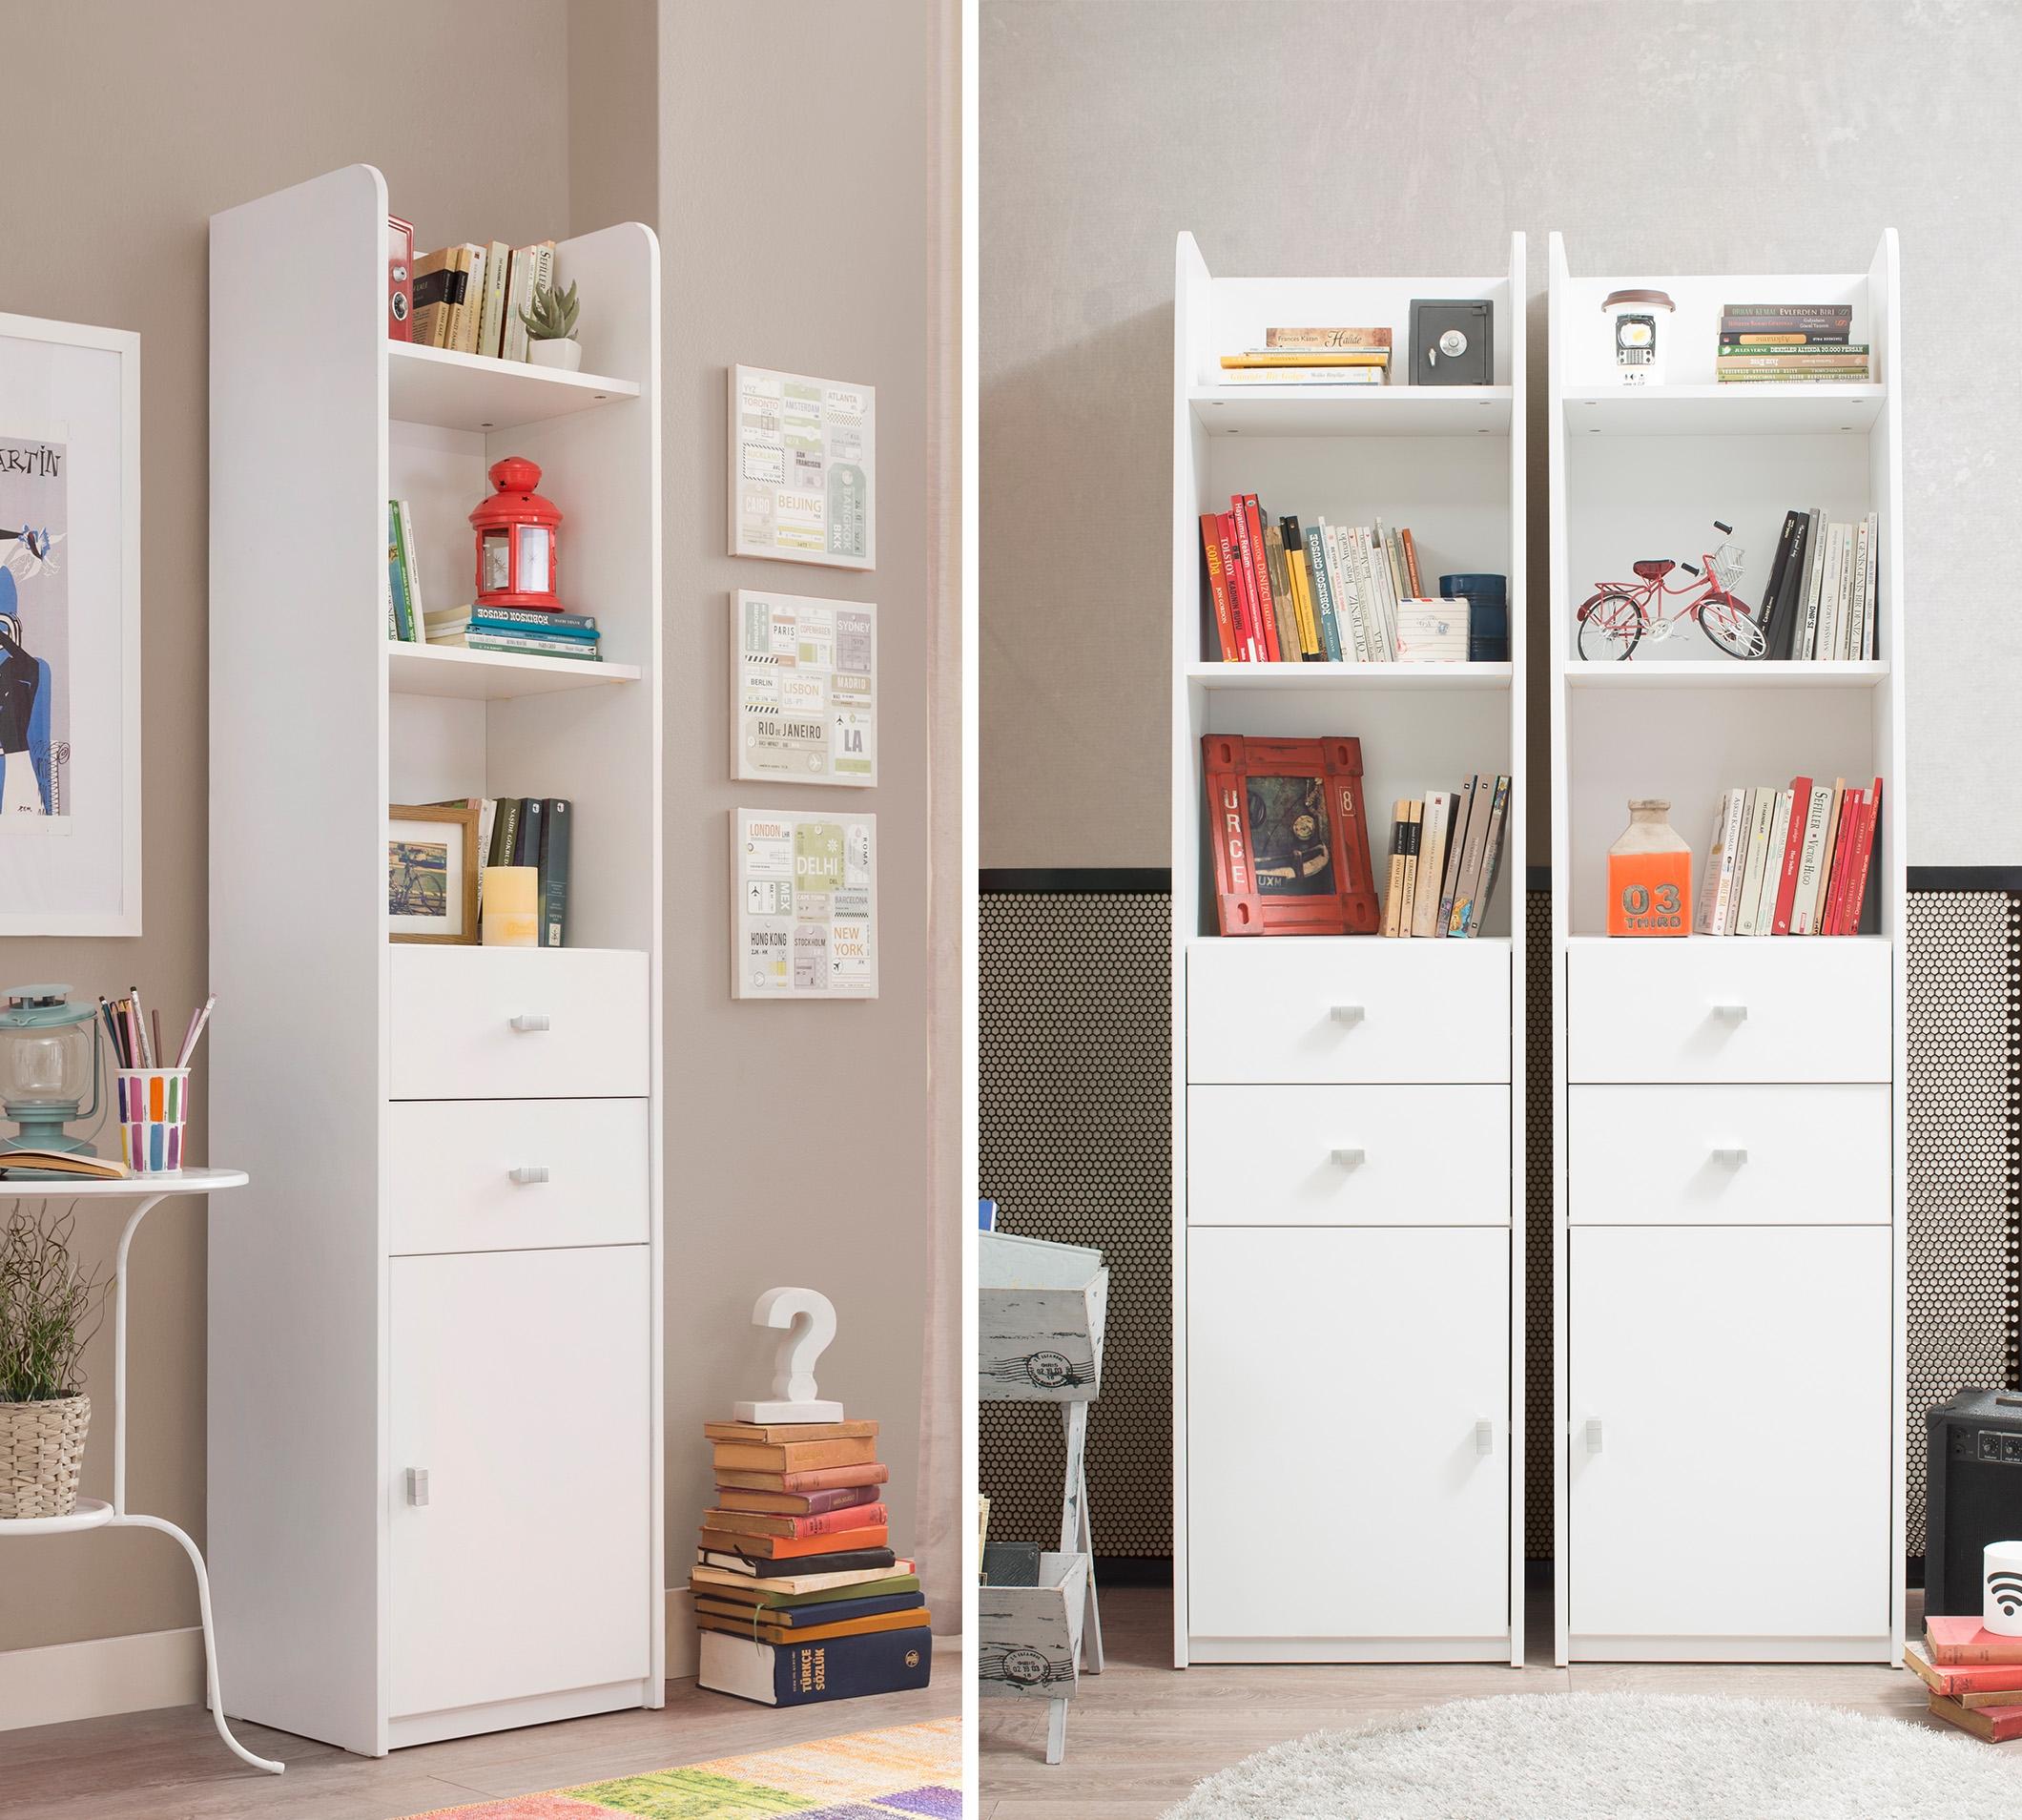 Boekenkast Kinderkamer – cartoonbox.info